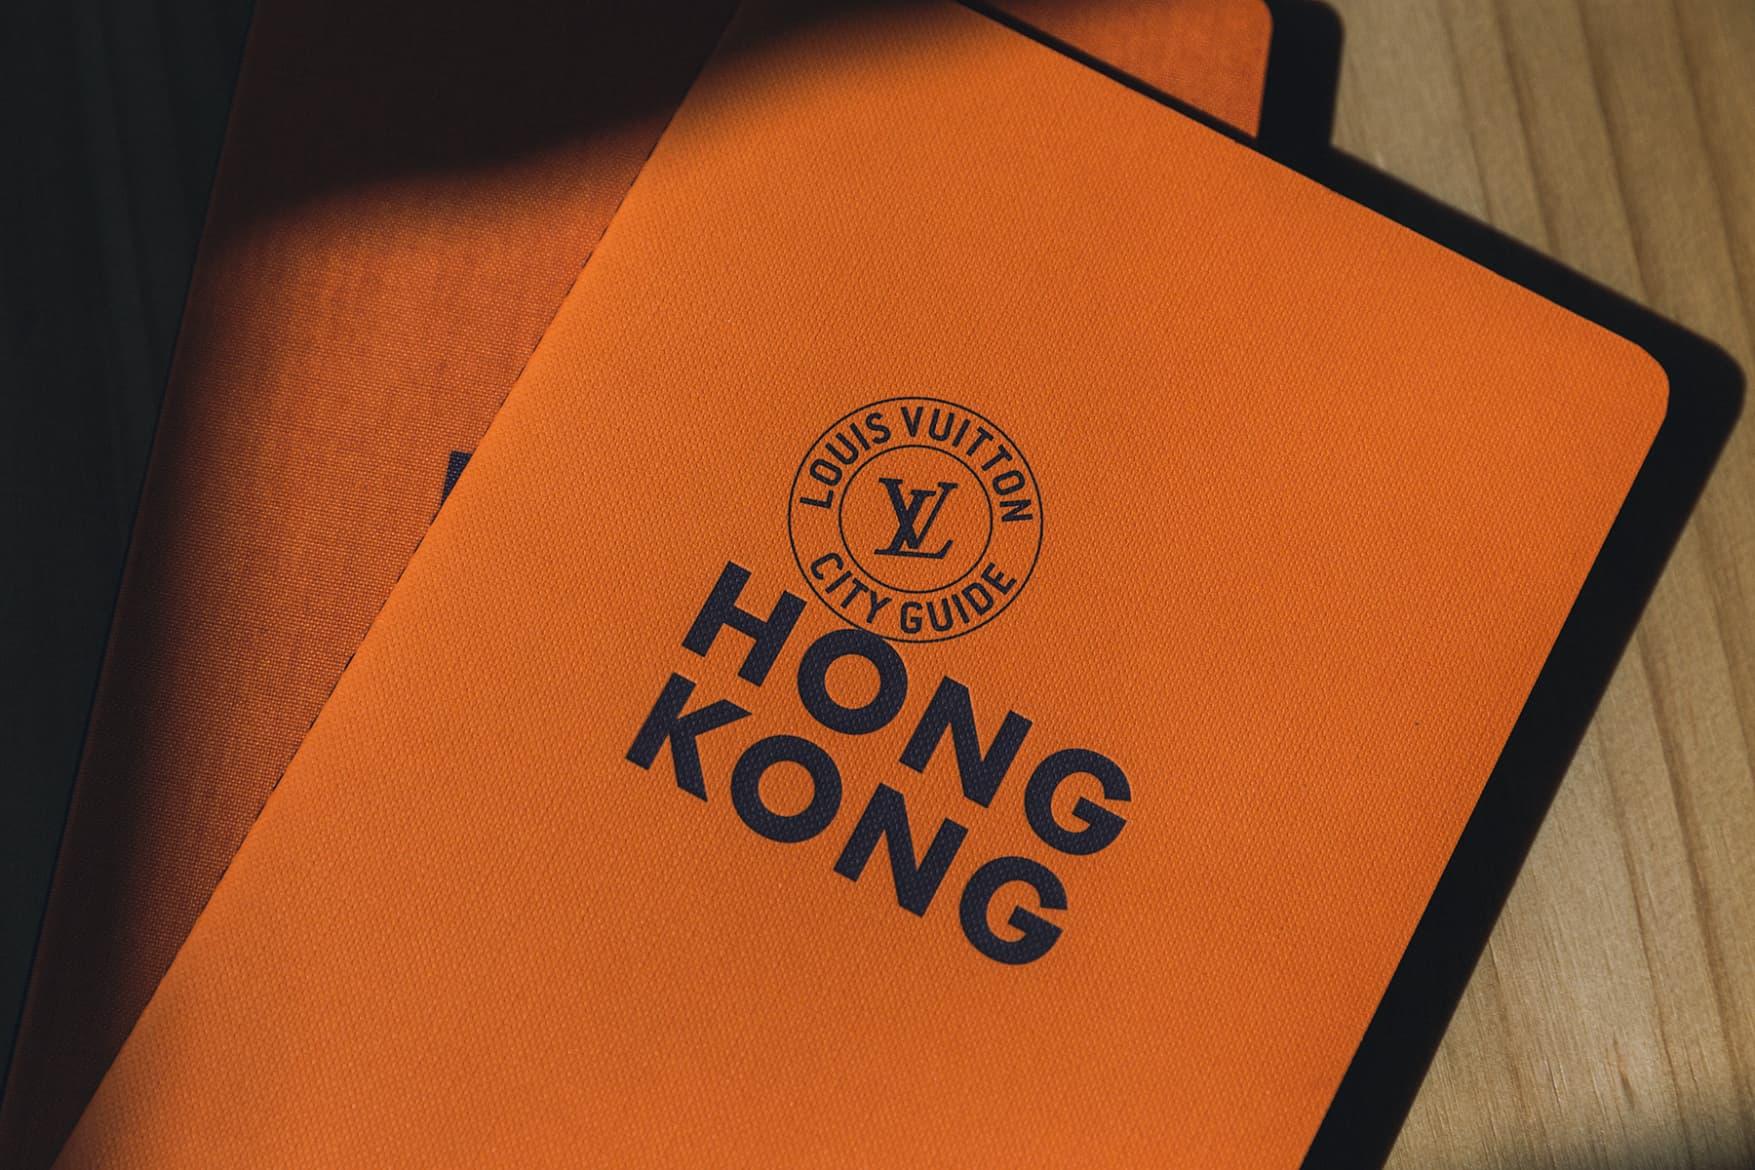 Louis Vuitton Launches Its New 2017 Hong Kong City Guide